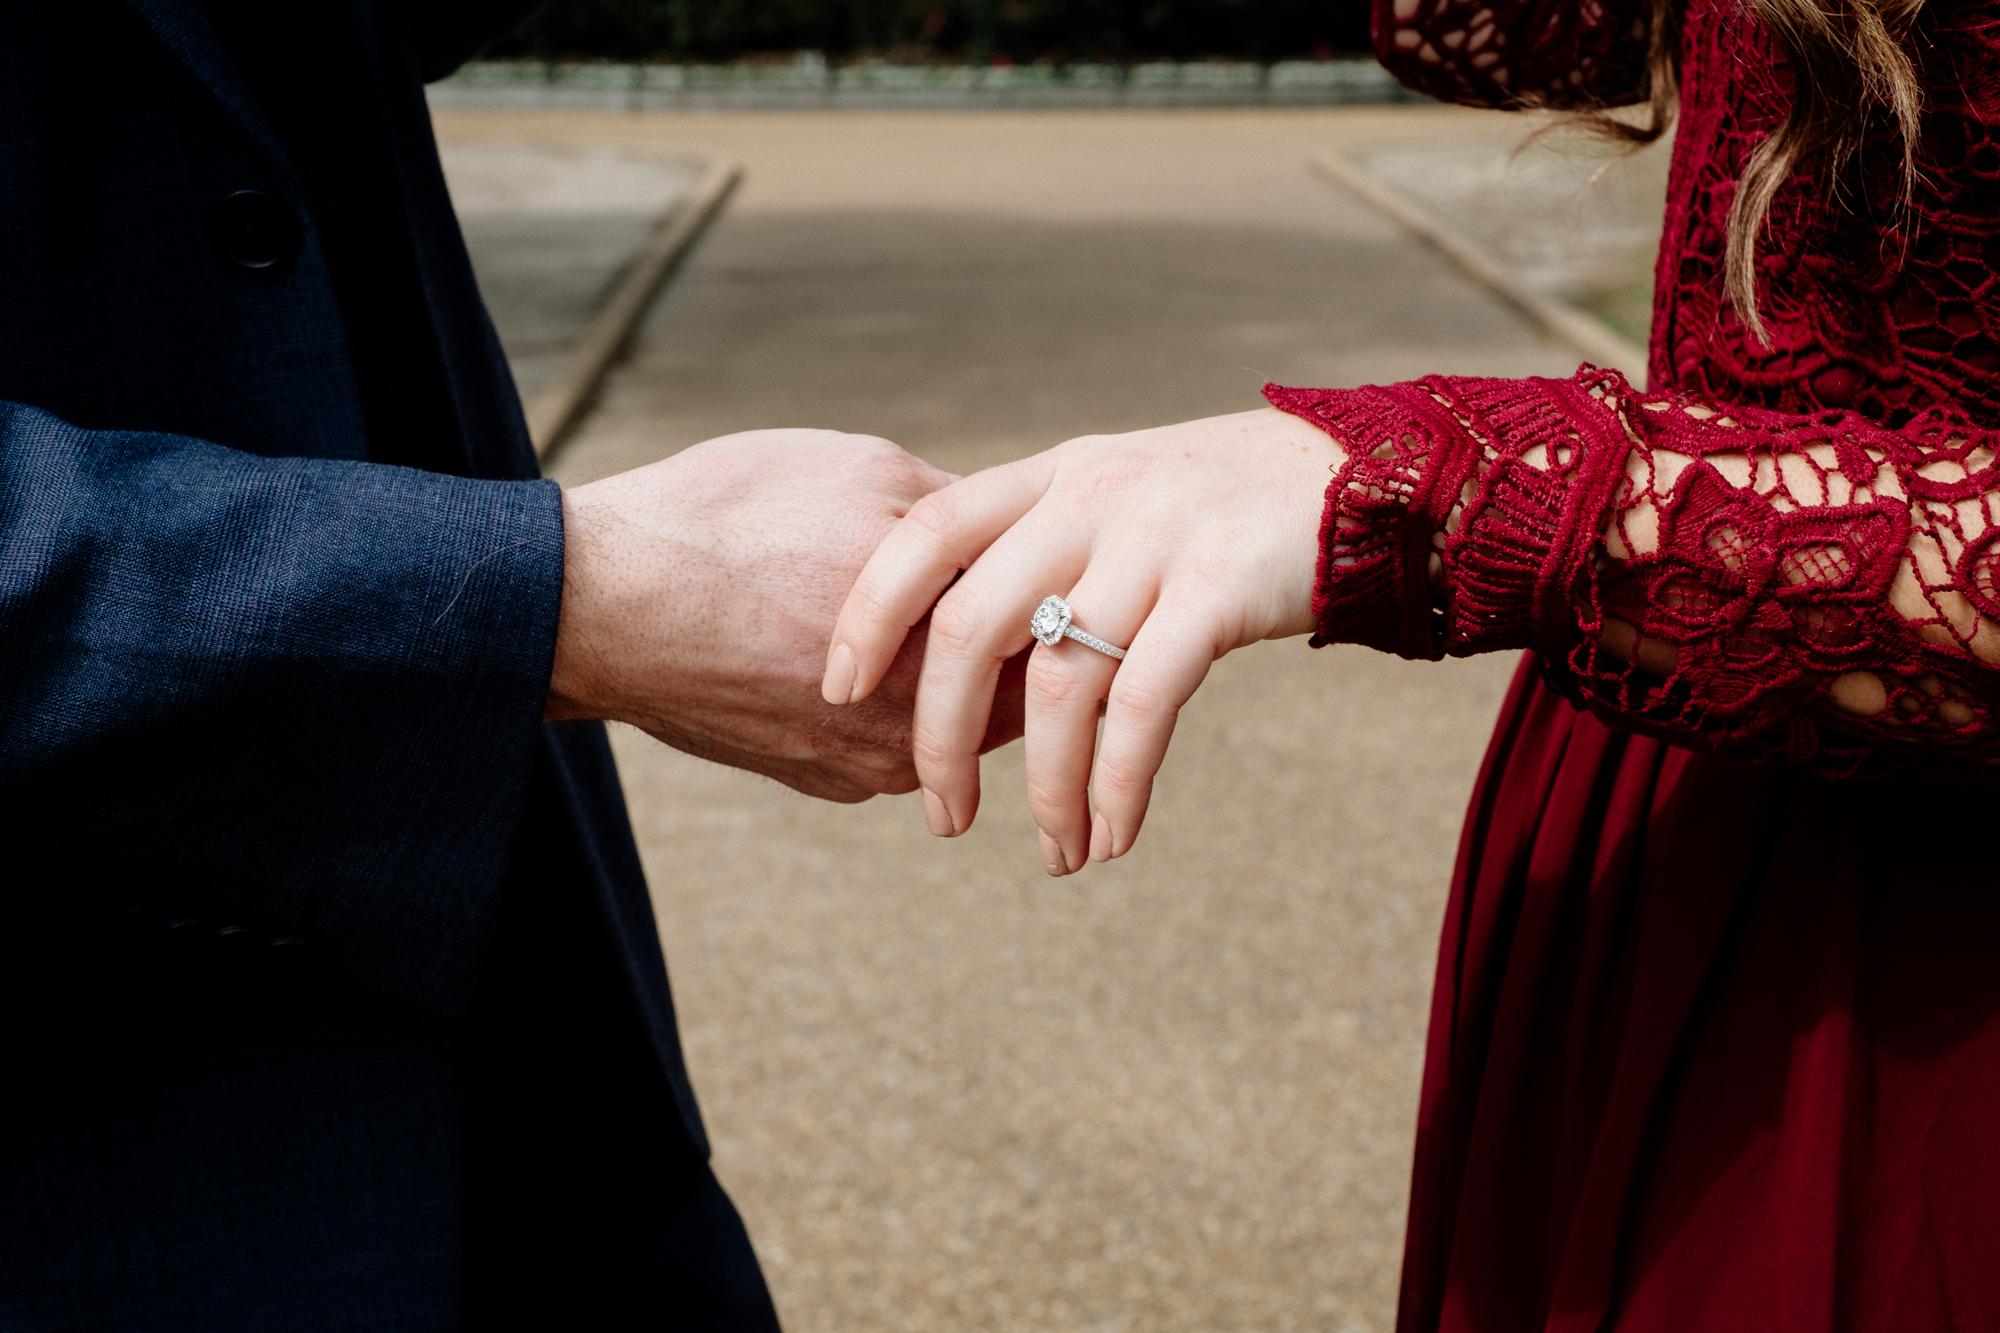 Jen_Montgomery_Photography_Angela_Brian_Engagement_Proposal_FB-35.jpg